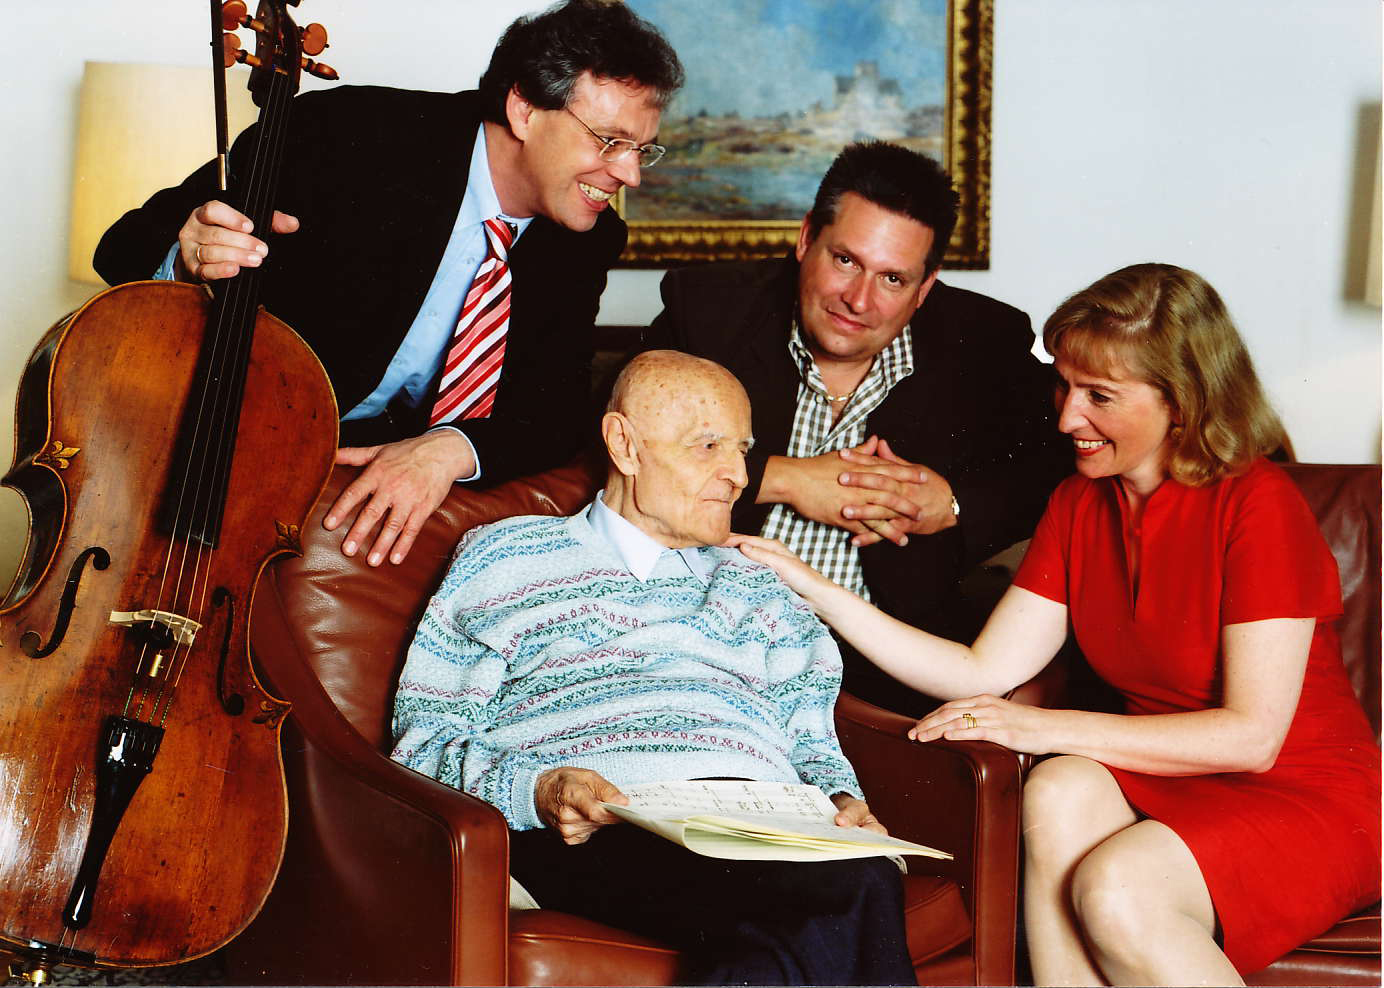 Julius Berger, Harald Genzmer (1909-2007), Peter Sadlo (1962-2016), Margarita Höhenrieder Foto: privat